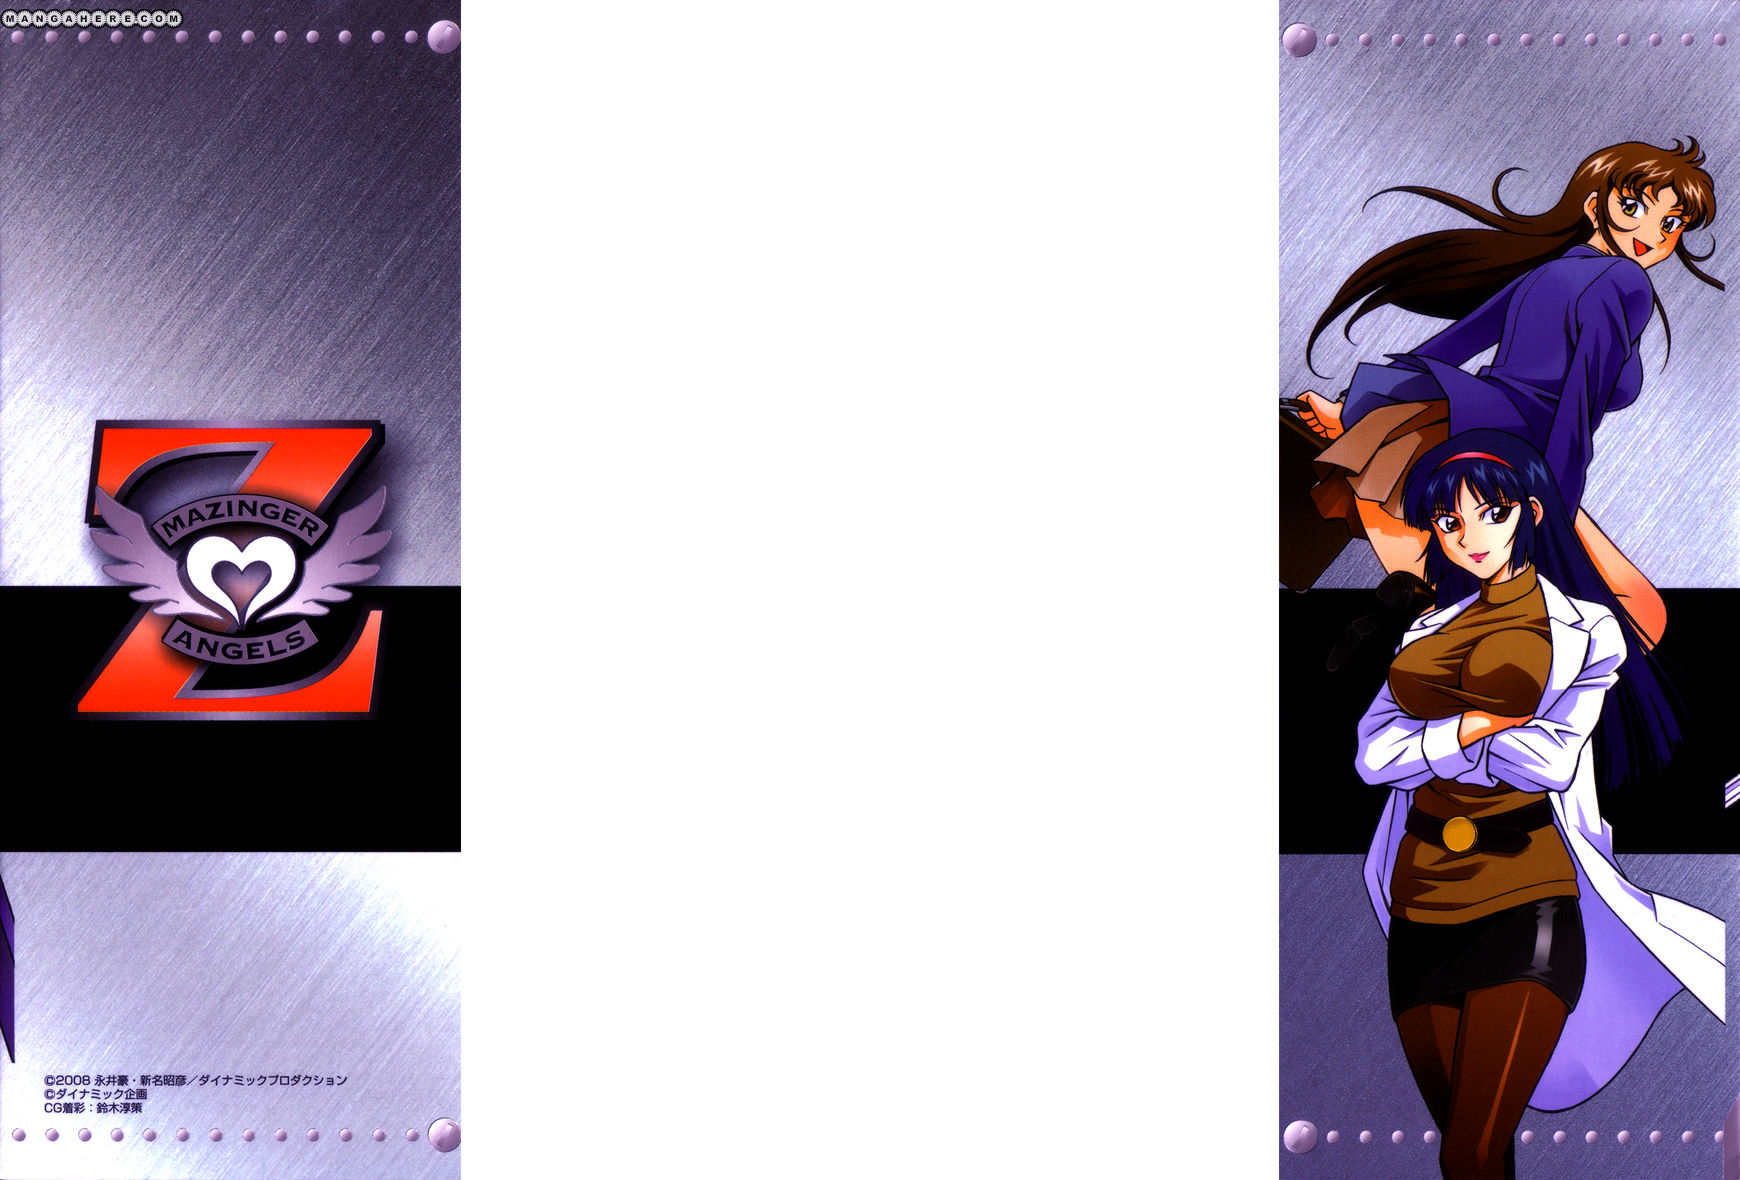 Mazinger Angel Z 7 Page 2